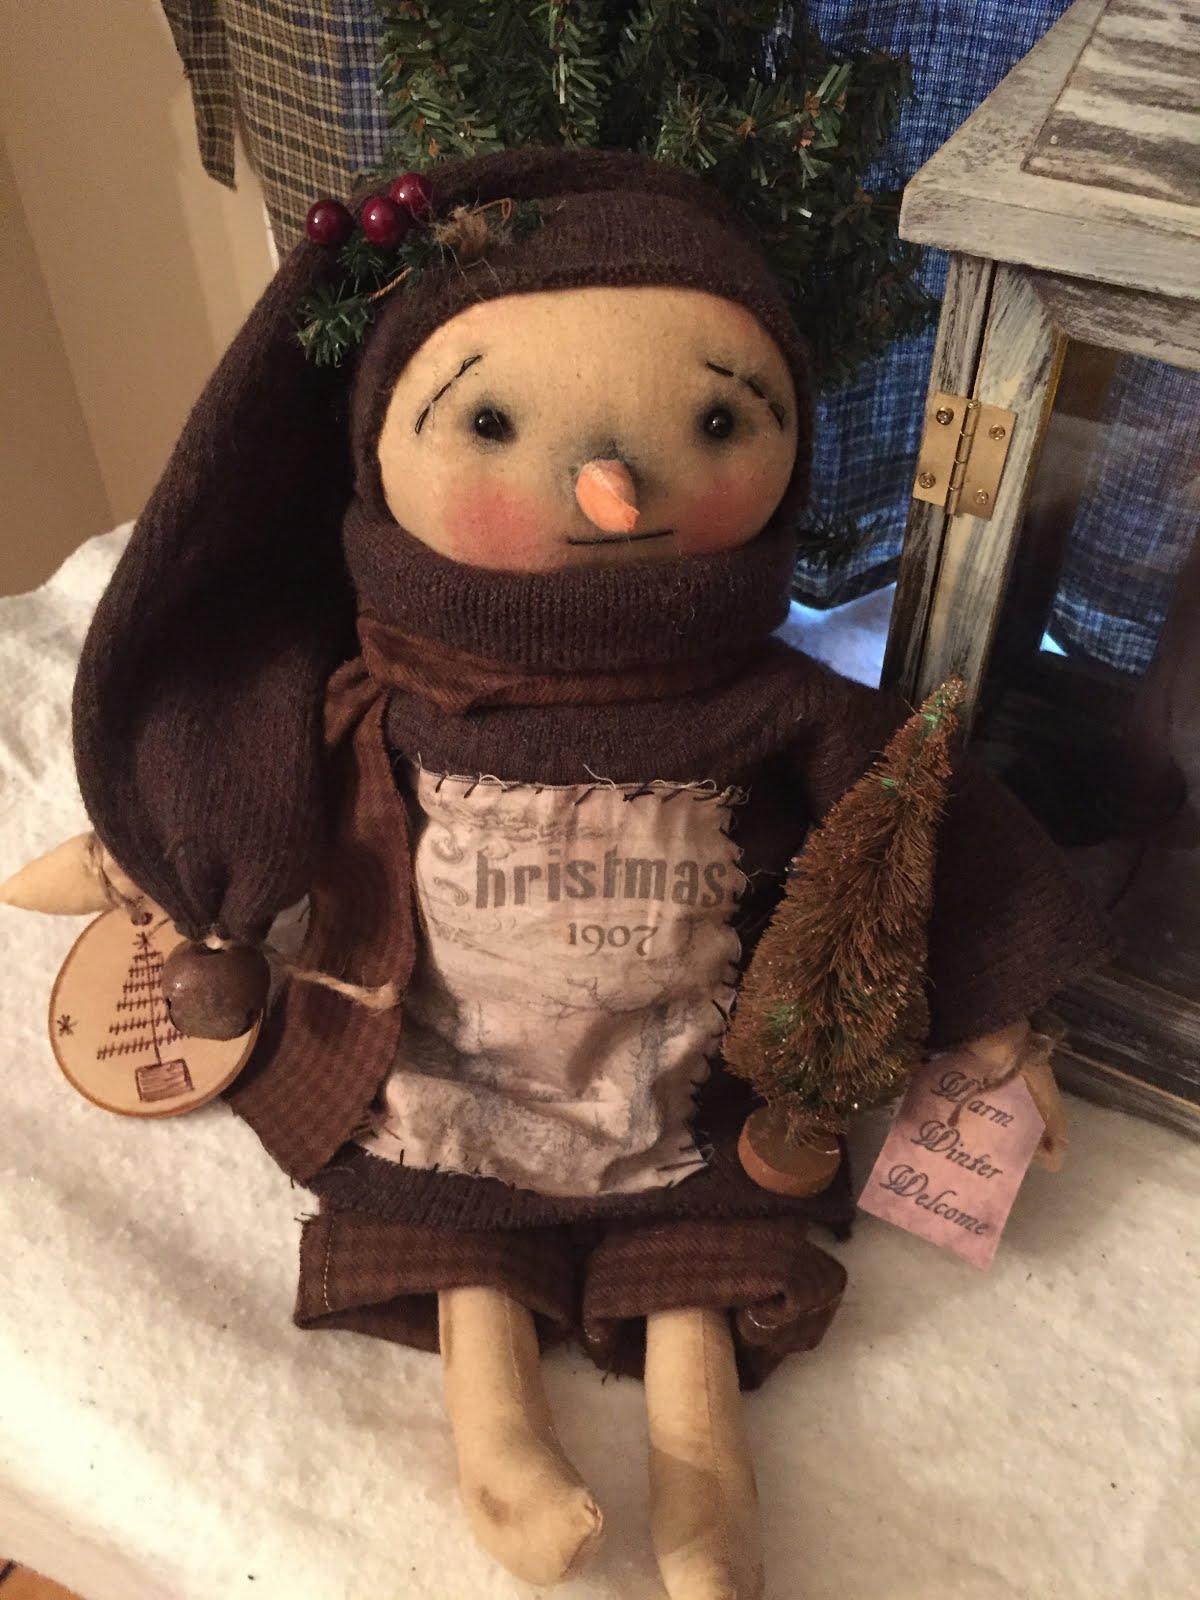 OOAK Christmas 1907 Sitting Snowman